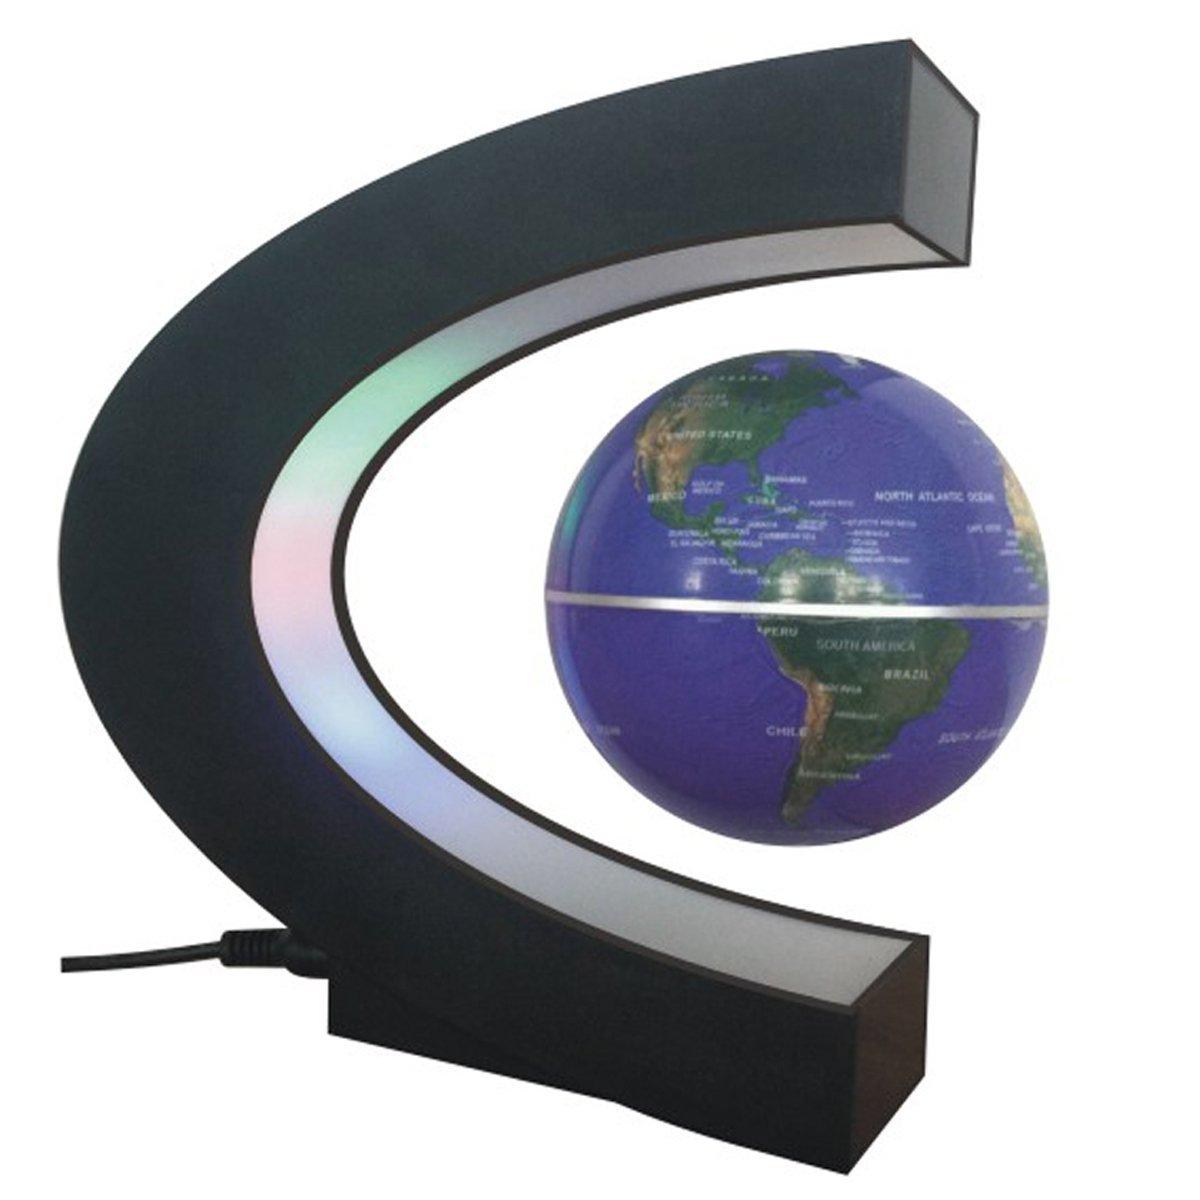 Umall Floating Globe, Magnetic Levitation Earth C Shape Anti Gravity Globe World Map with LED Lights 360 Degree Rotating for Learning Education Teaching Home Office Desk Decoration